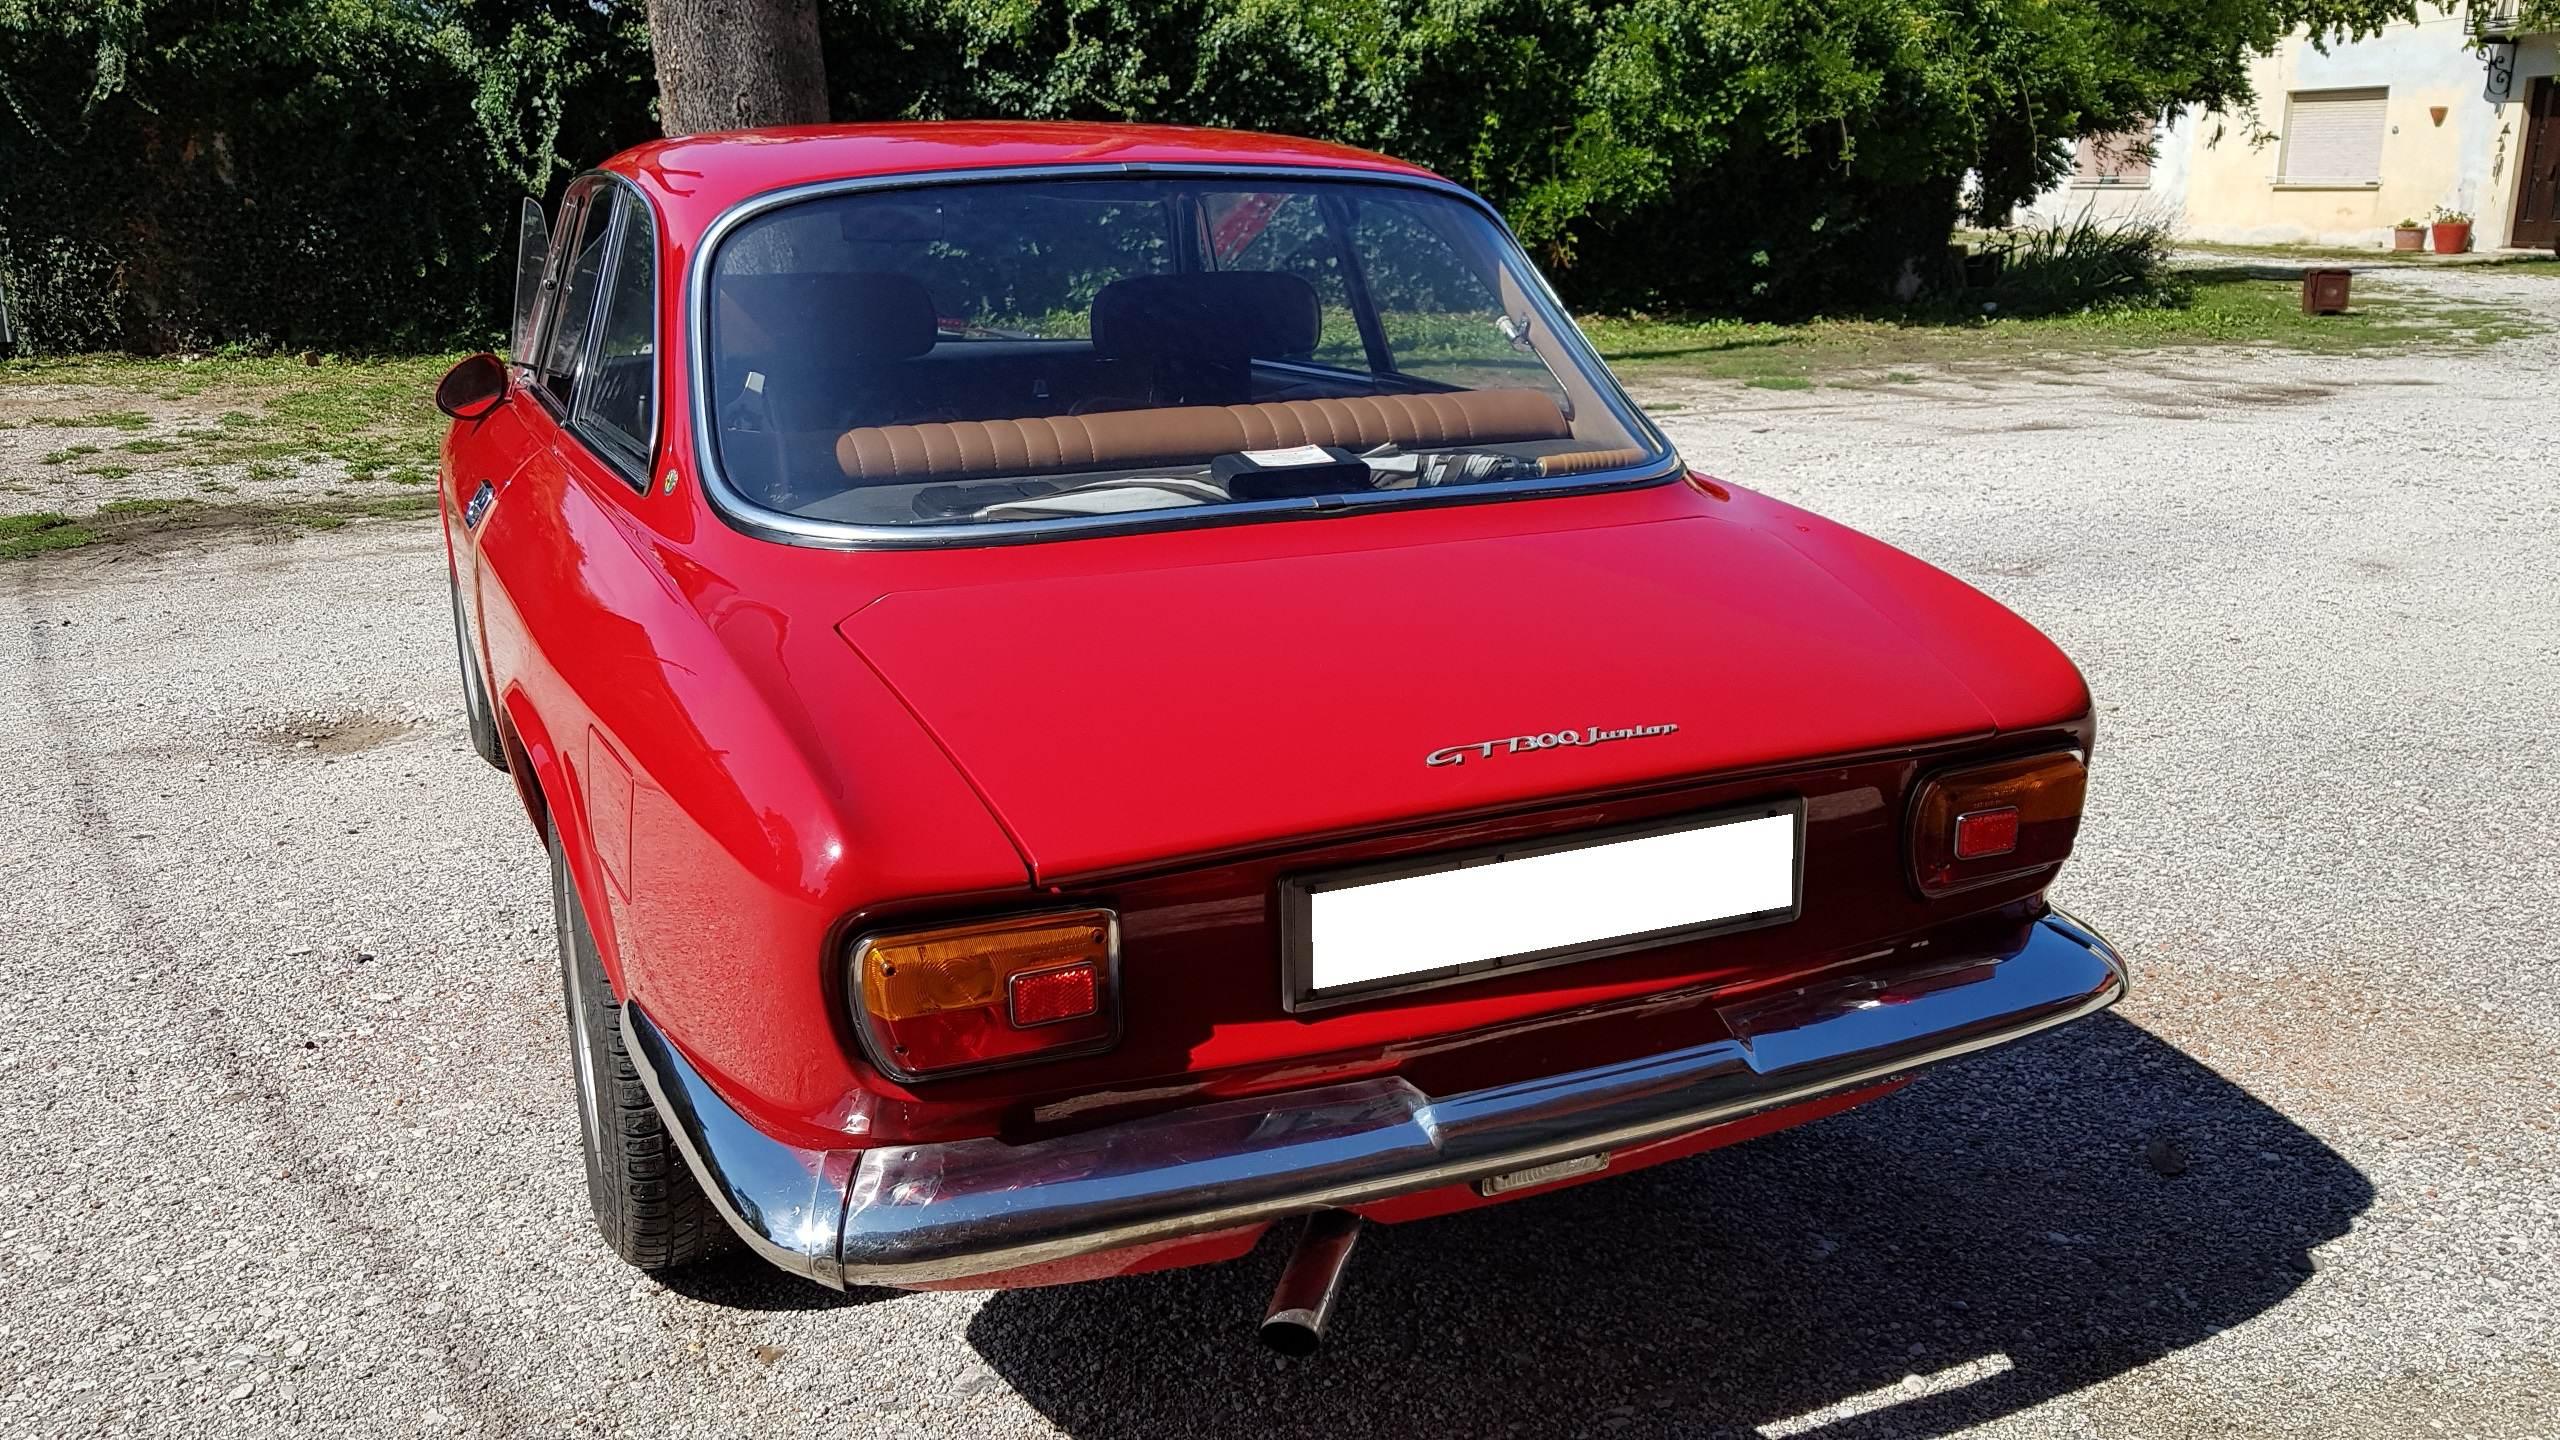 foto GT Junior 1300 scalino (1968) - 6